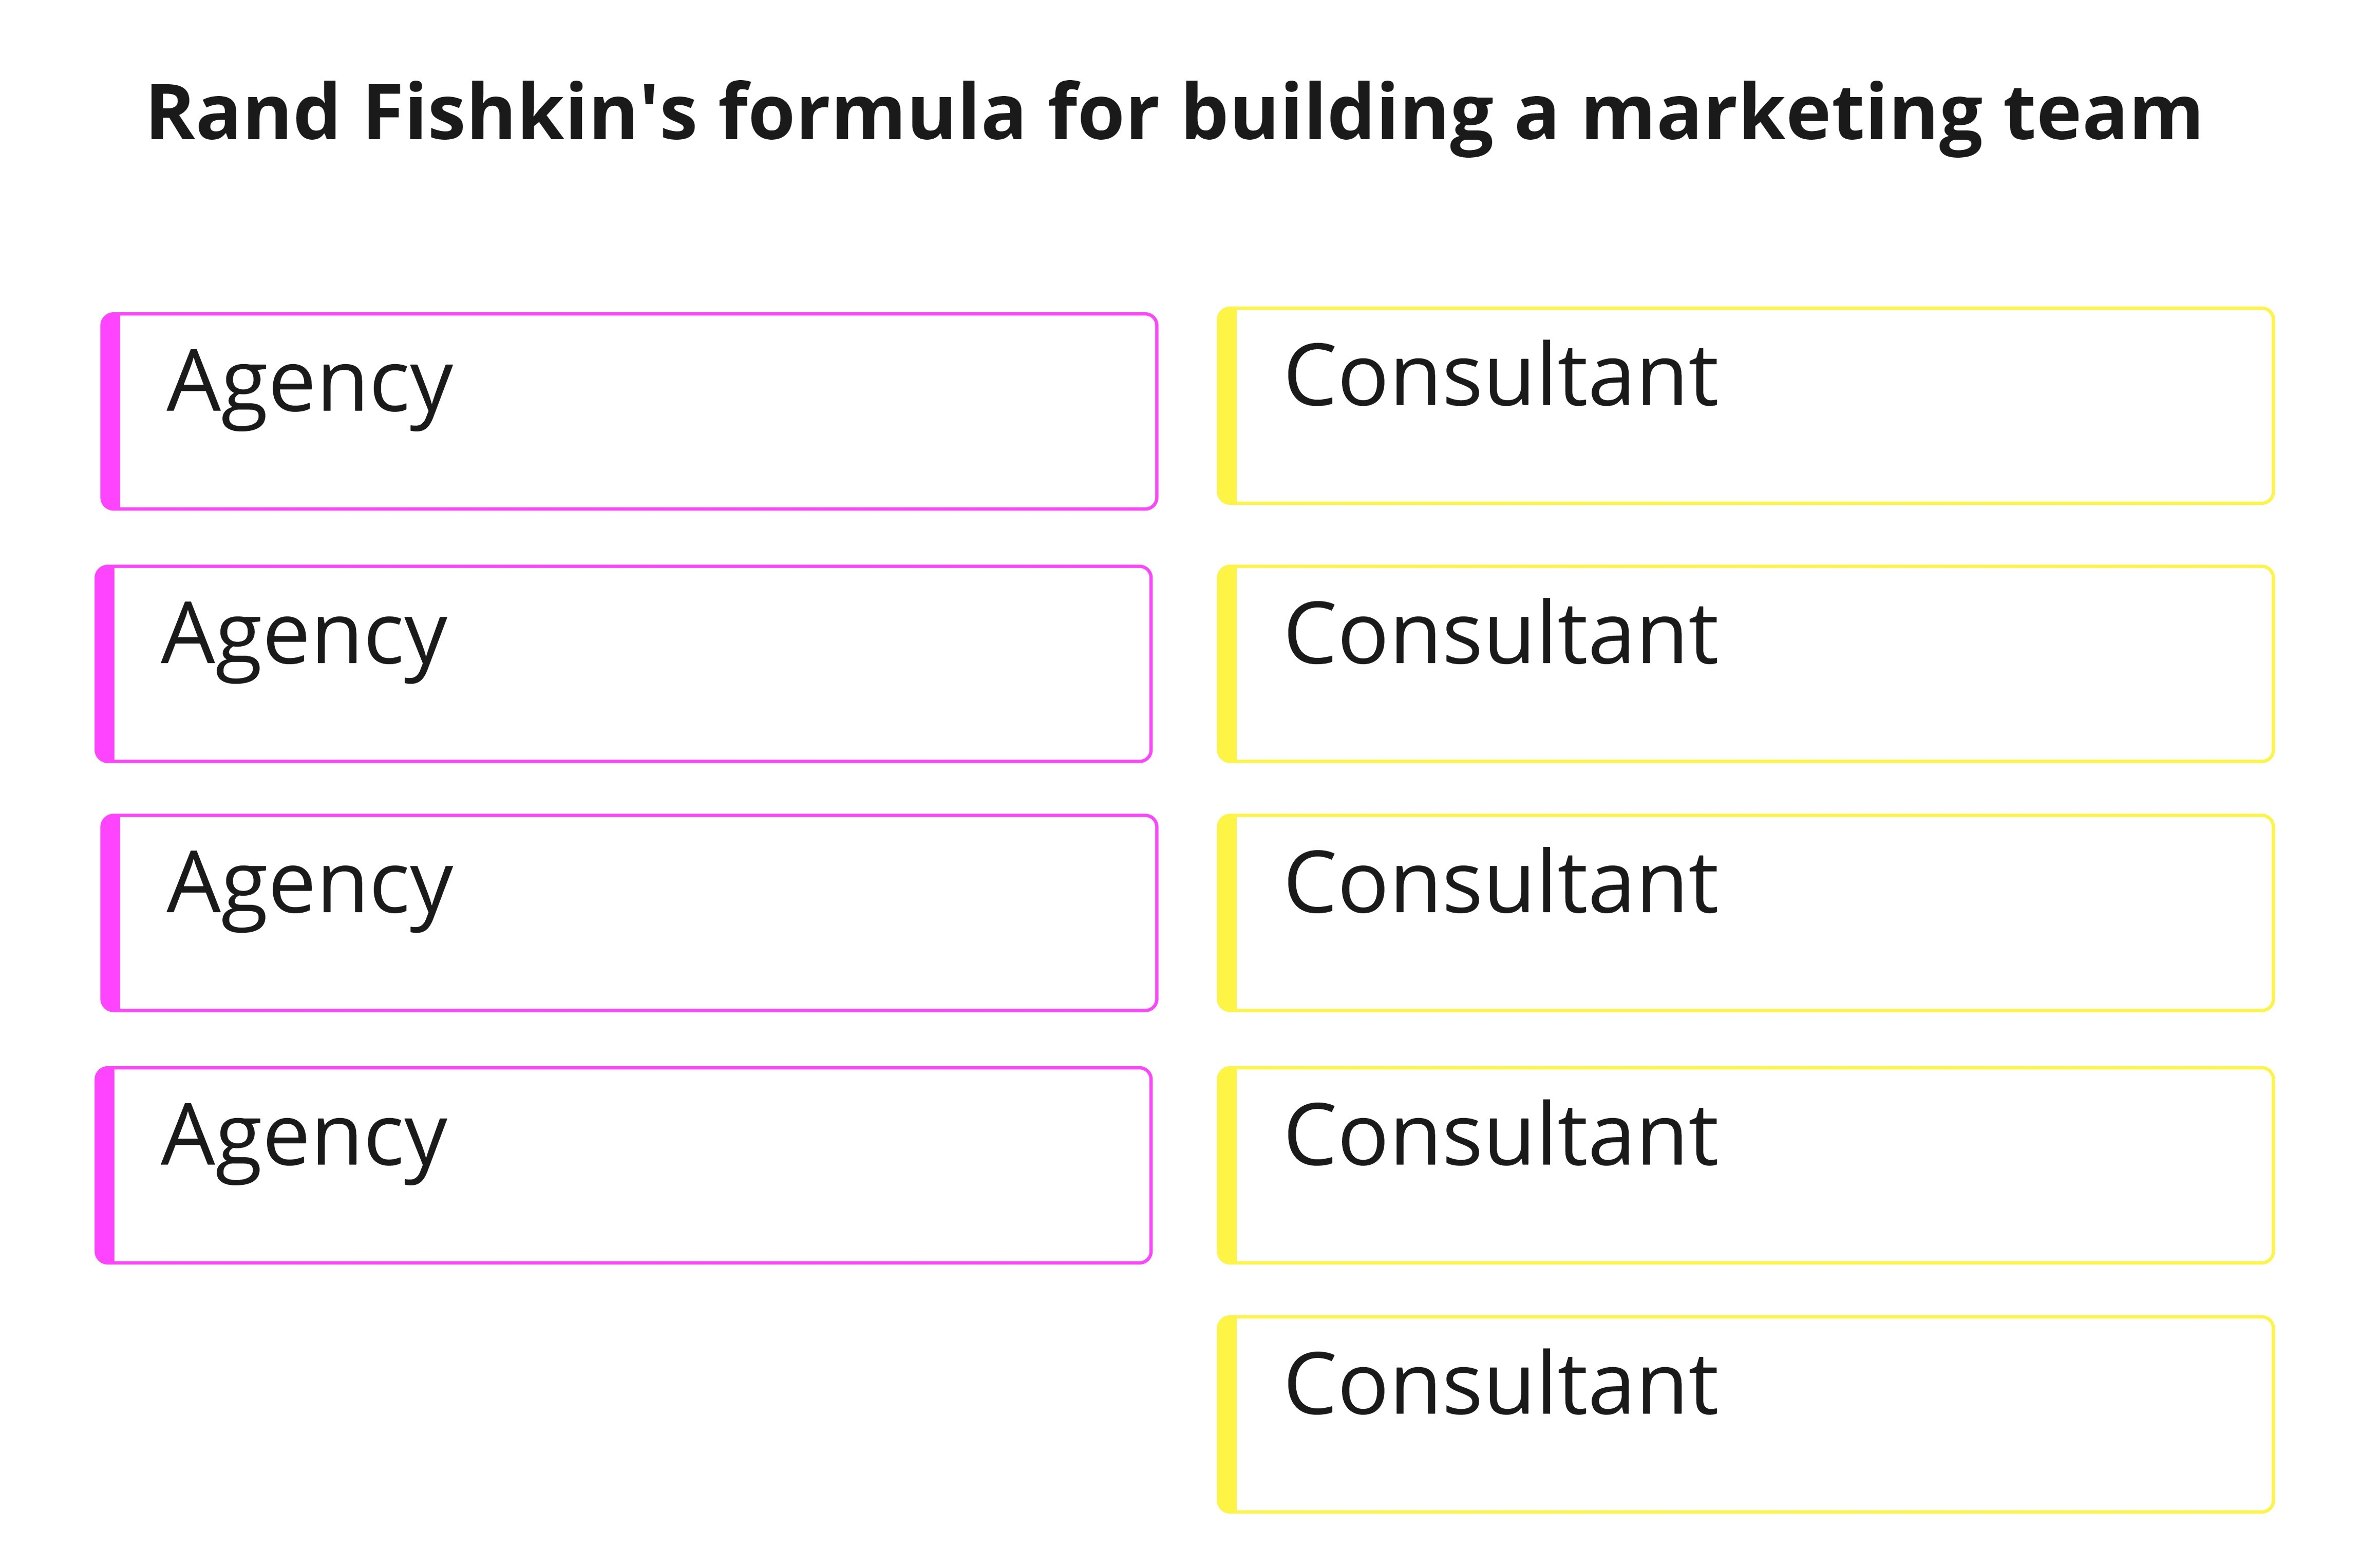 Rand Fishkin's formula for building a marketing team